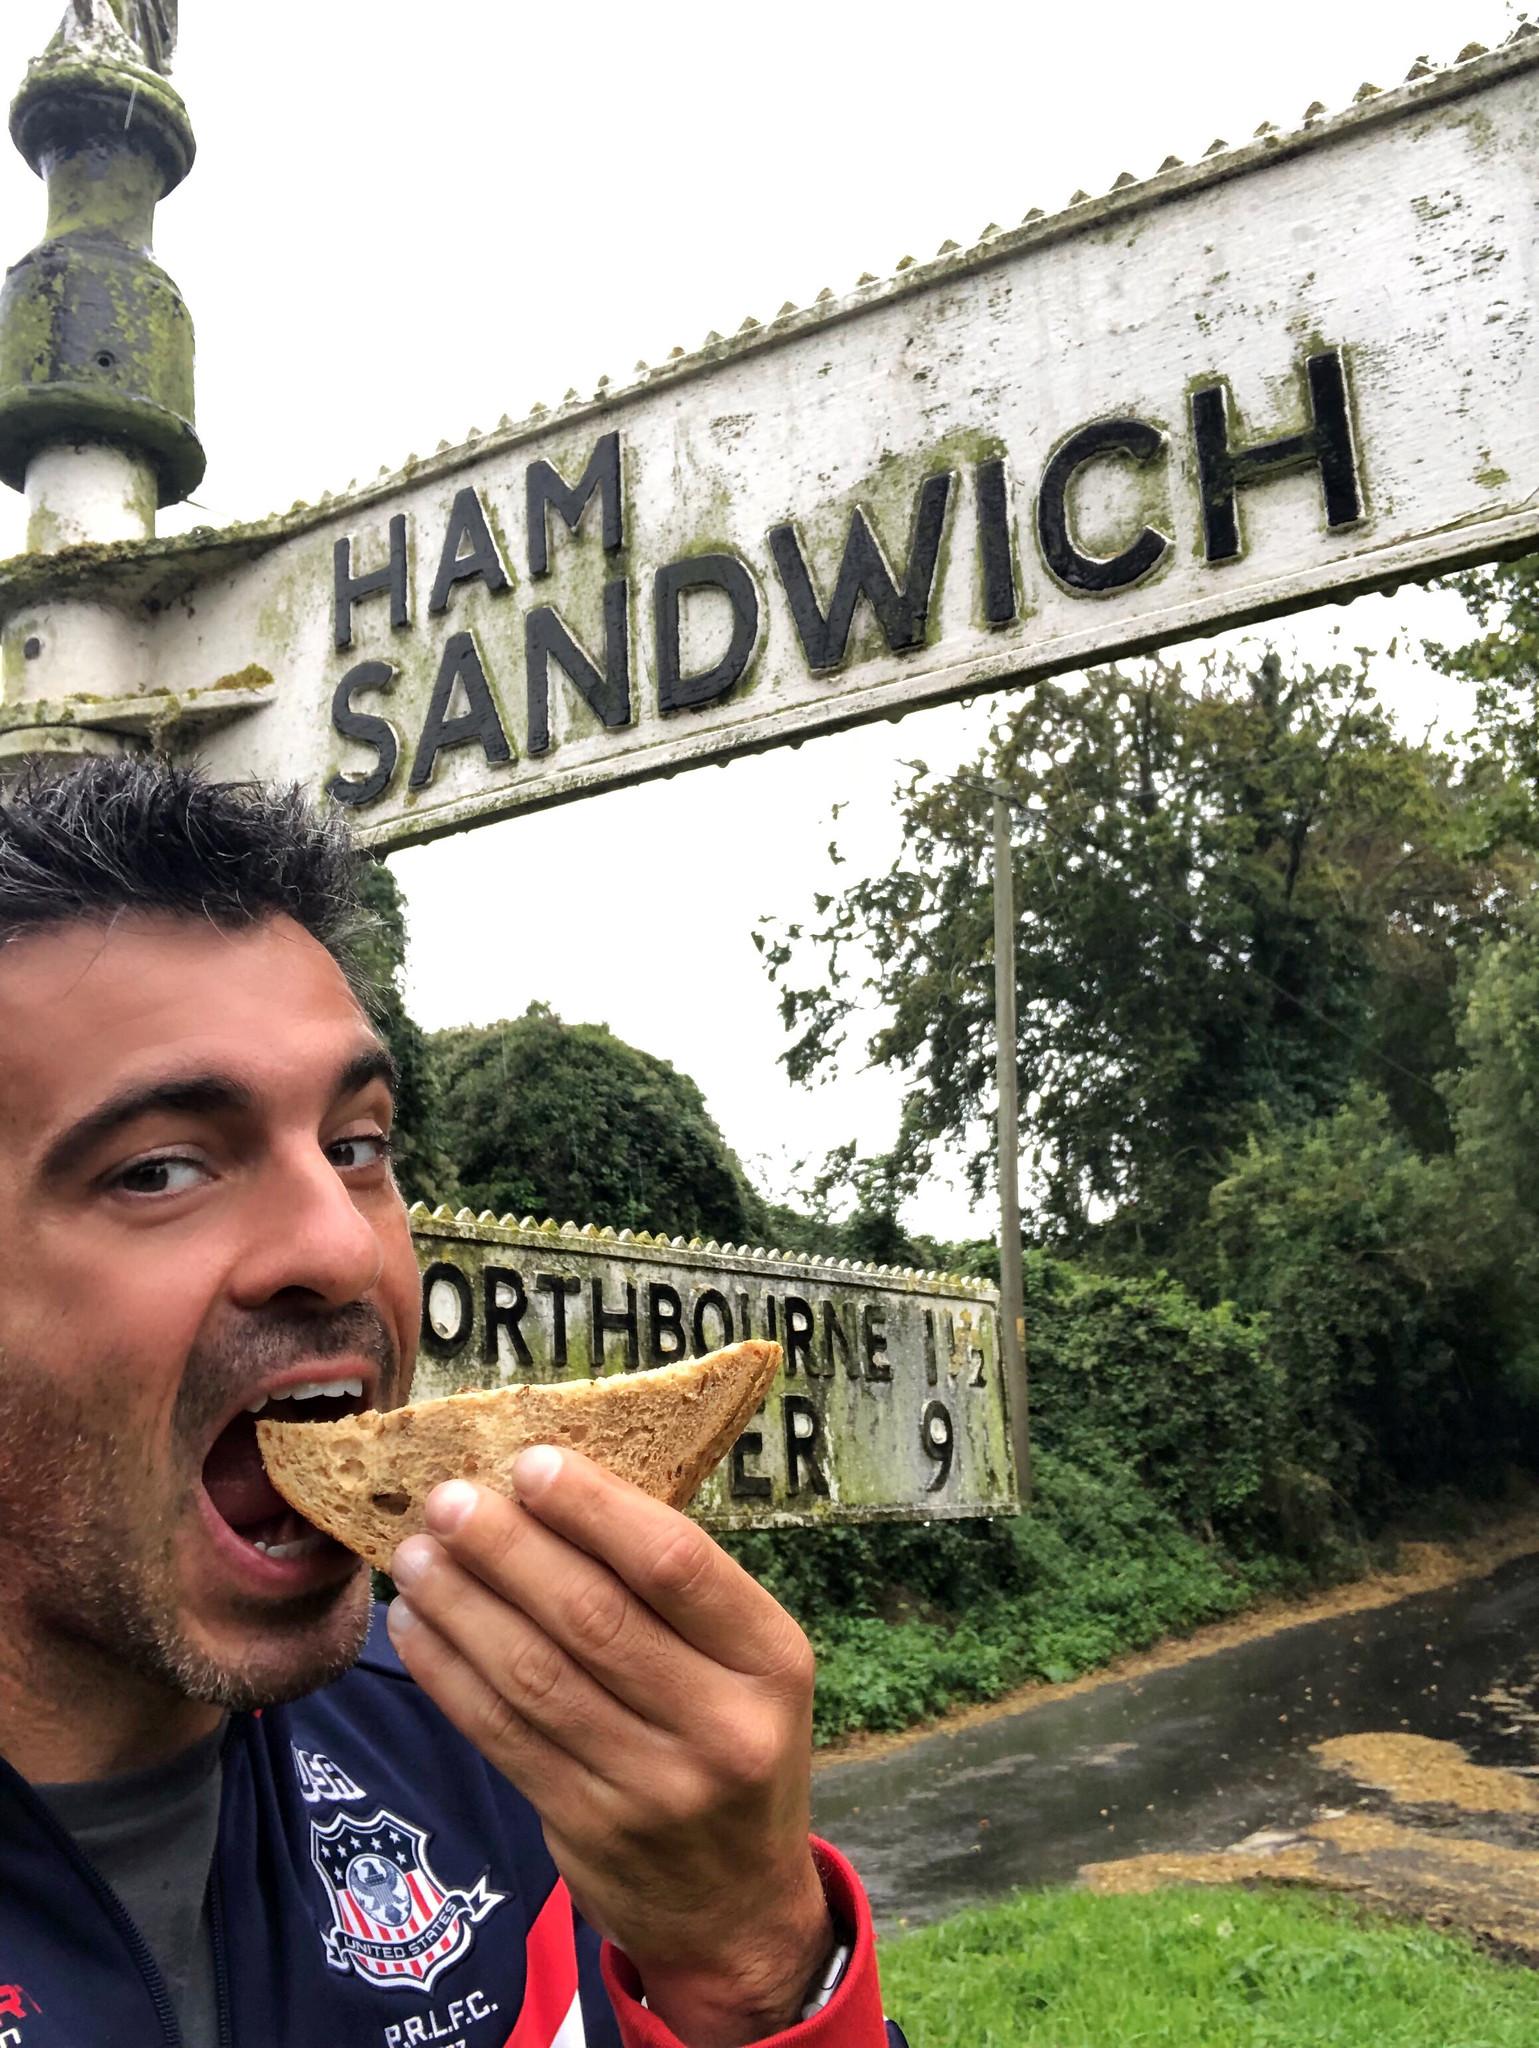 Sandwich, Kent, Inglaterra, UK, pueblo - thewotme sandwich - 50001157108 baa0c0f402 k - Sandwich, un lugar en boca de todos